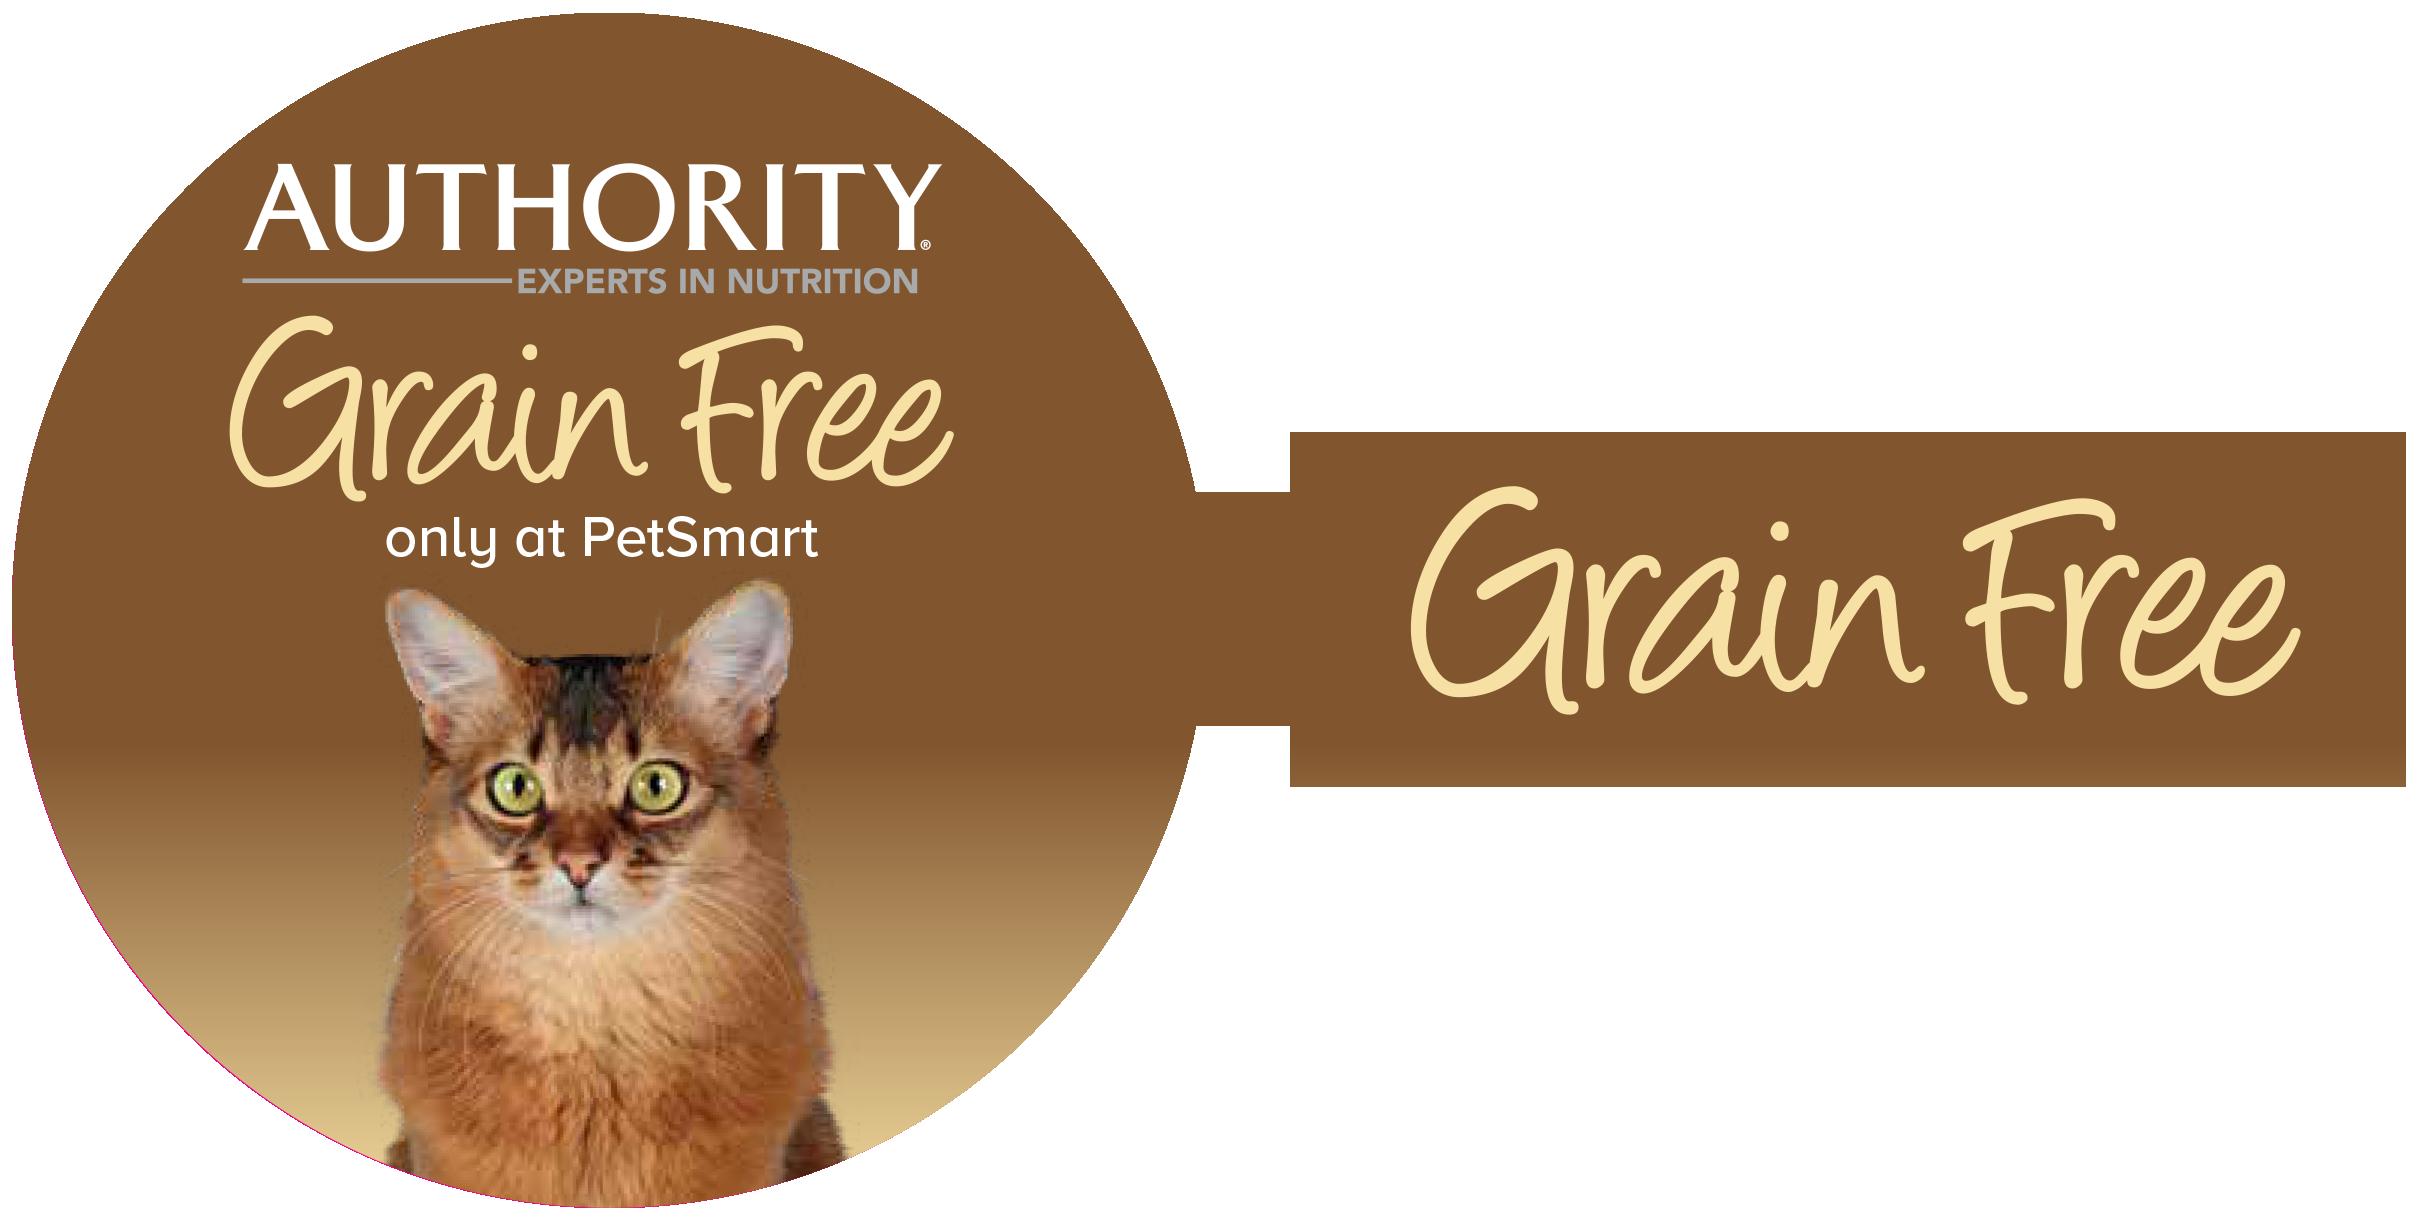 PetSmart-Authority_GrainFree-Cat-Violator_11-2016